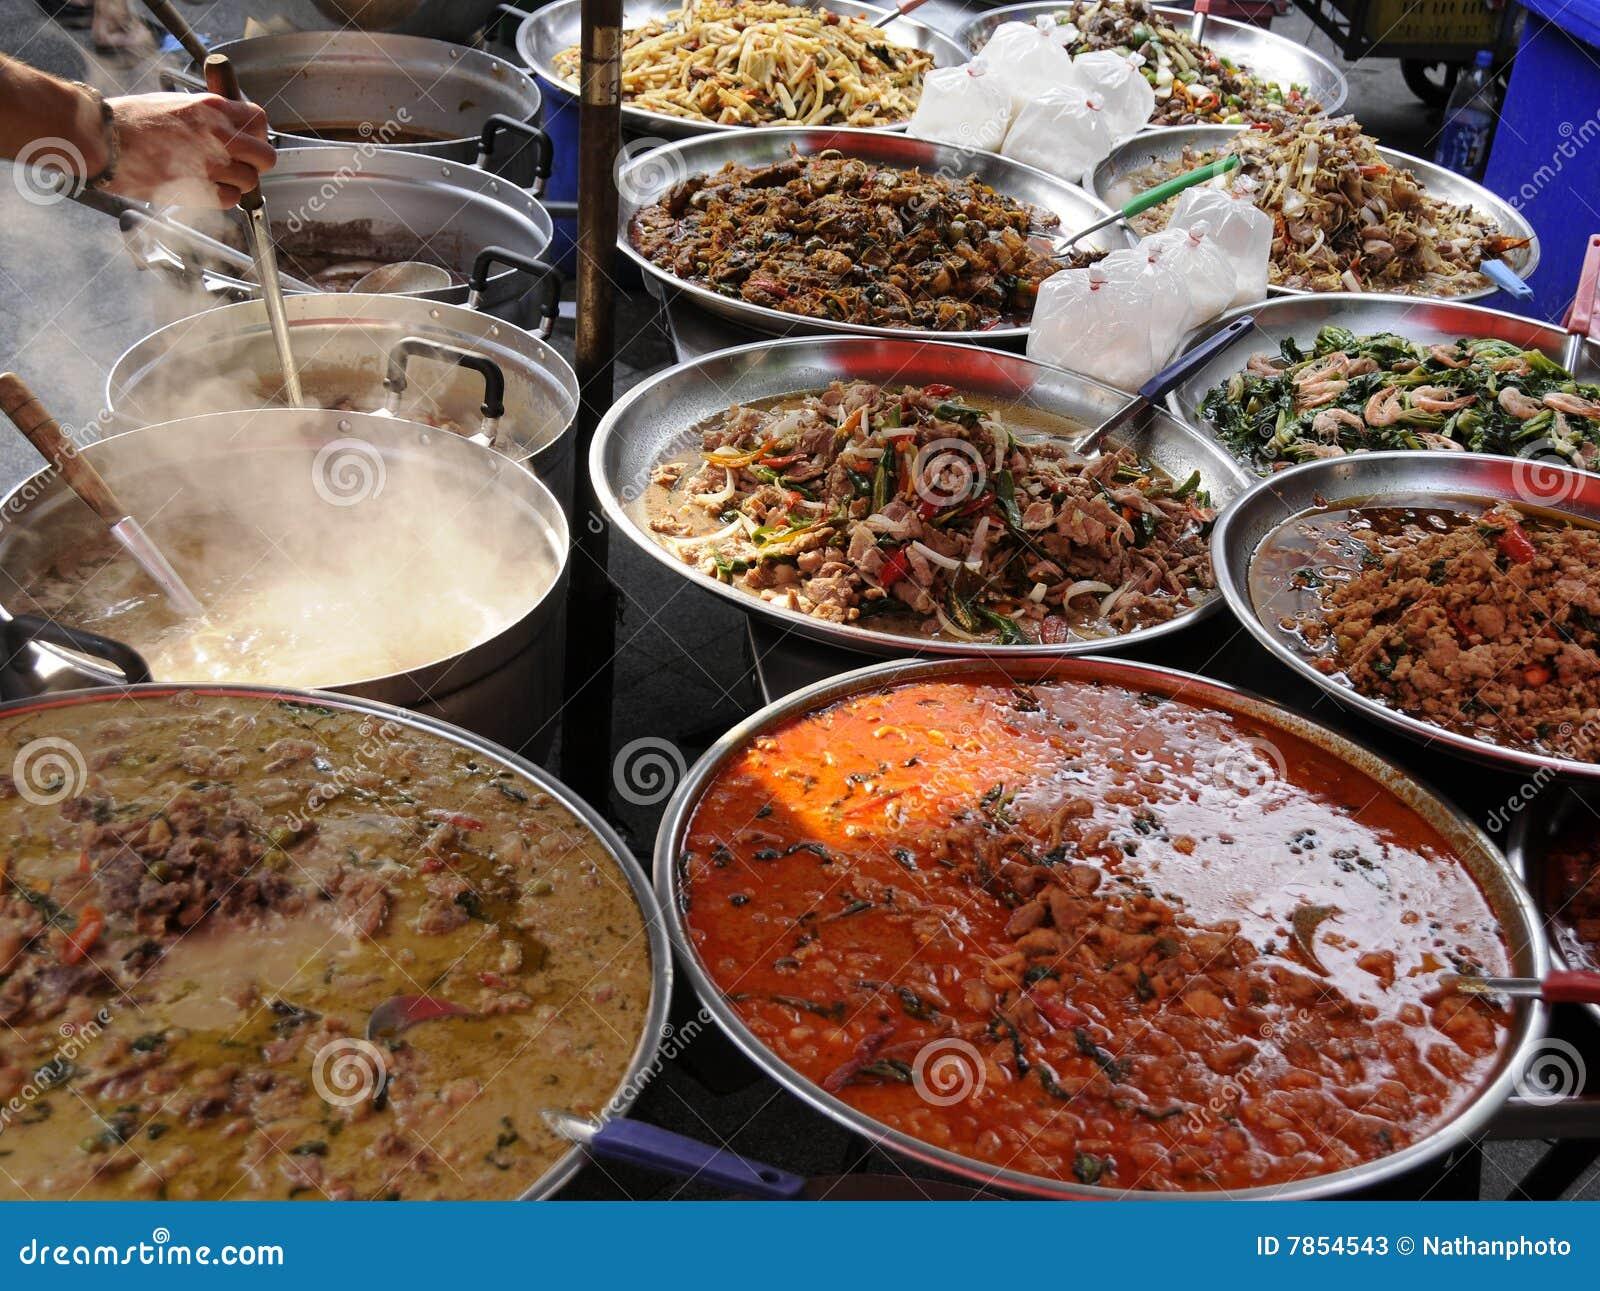 Authentic street food bangkok thailand stock image for Cuisine bangkok